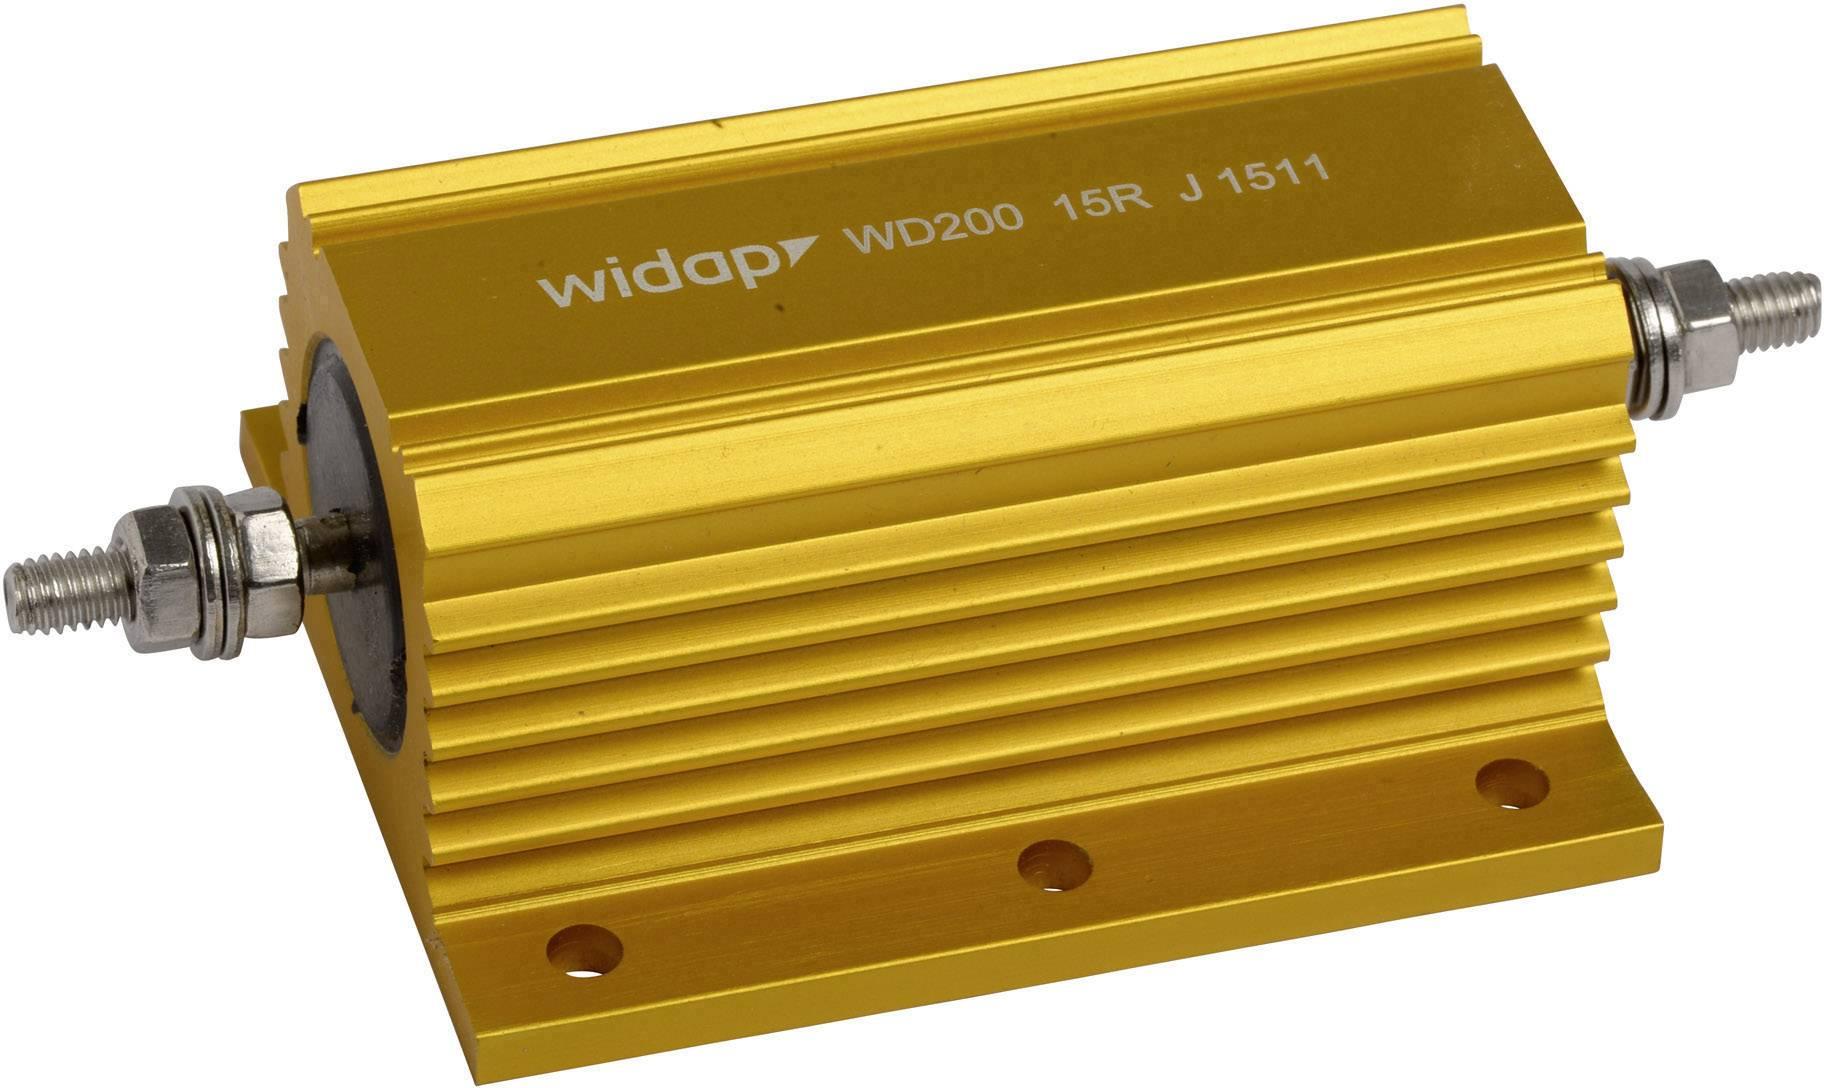 Drôtový rezistor Widap 160168, hodnota odporu 1.5 Ohm, 300 W, 1 ks